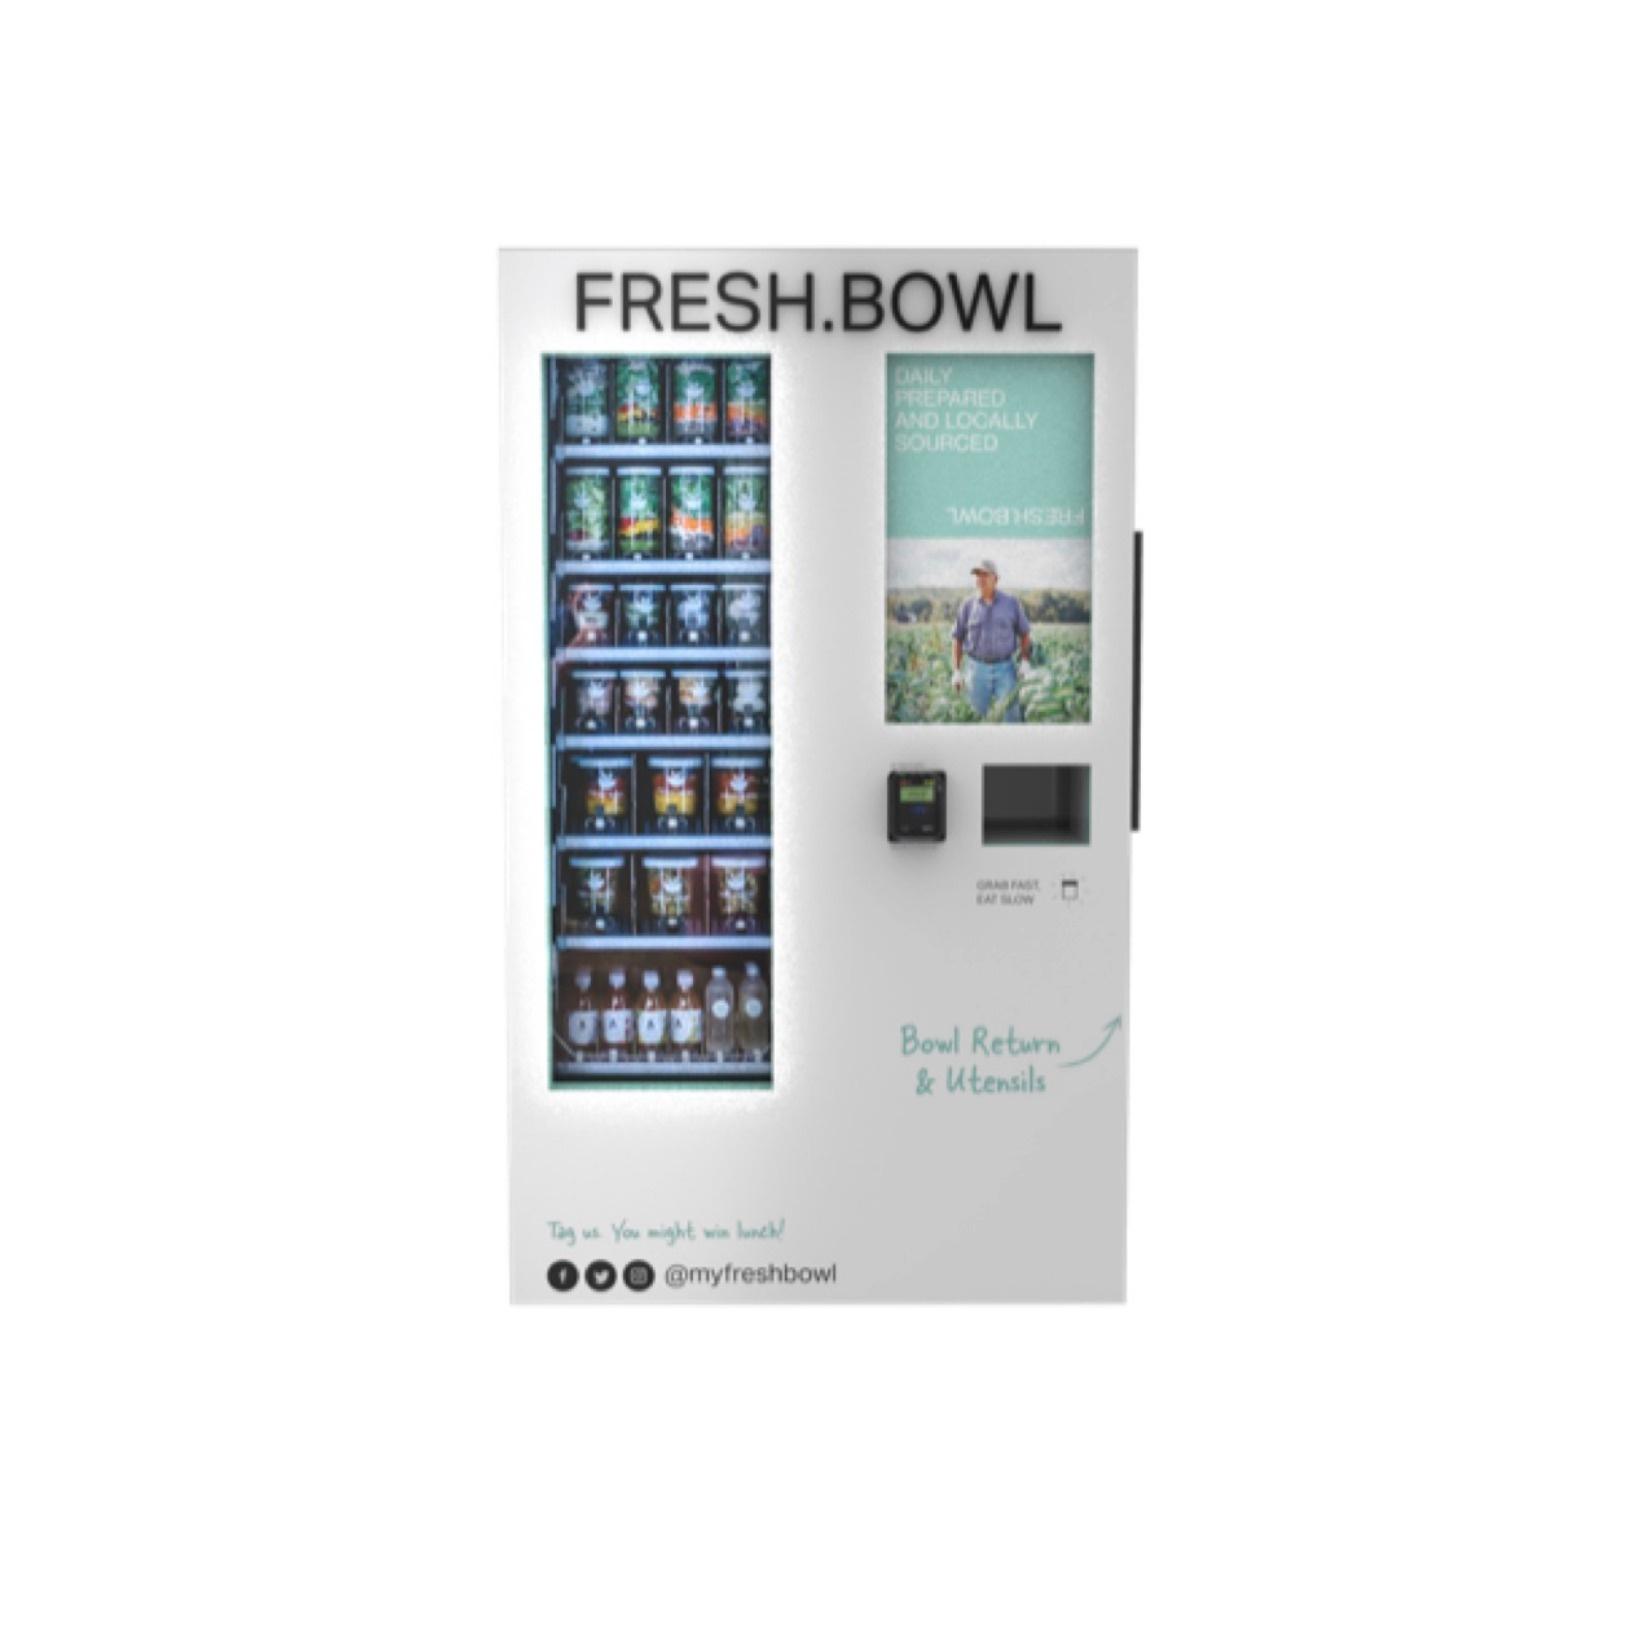 Episode 189: Fresh.Bowl Vending Machine